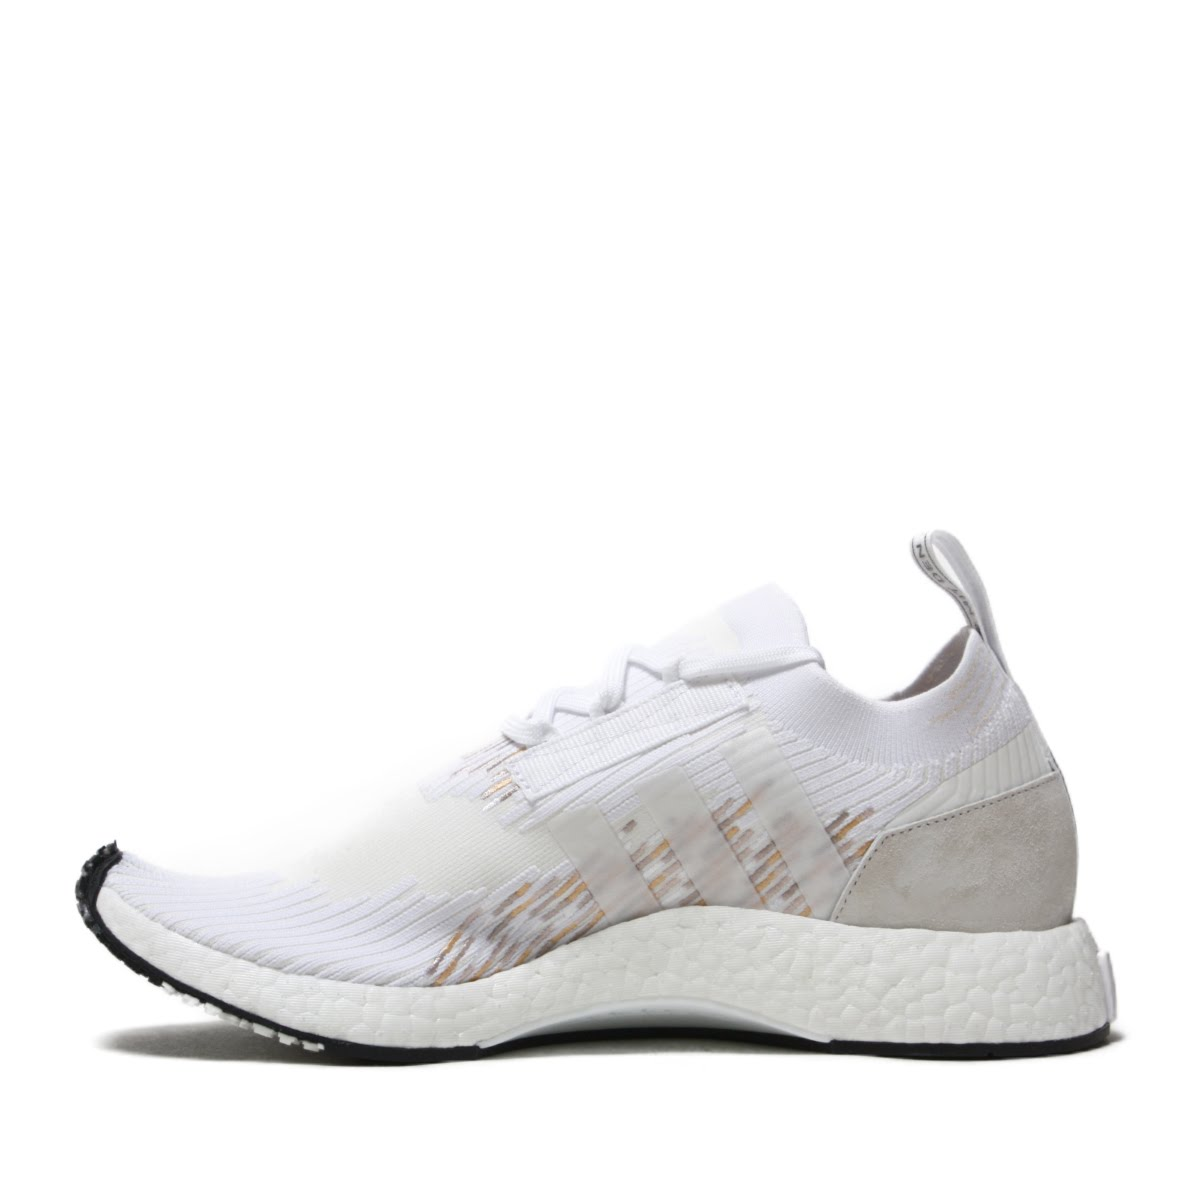 48b0000d165c7 adidas NMD RACER PK (Adidas N M D racer PK) running white   running white    running white 18FW-I